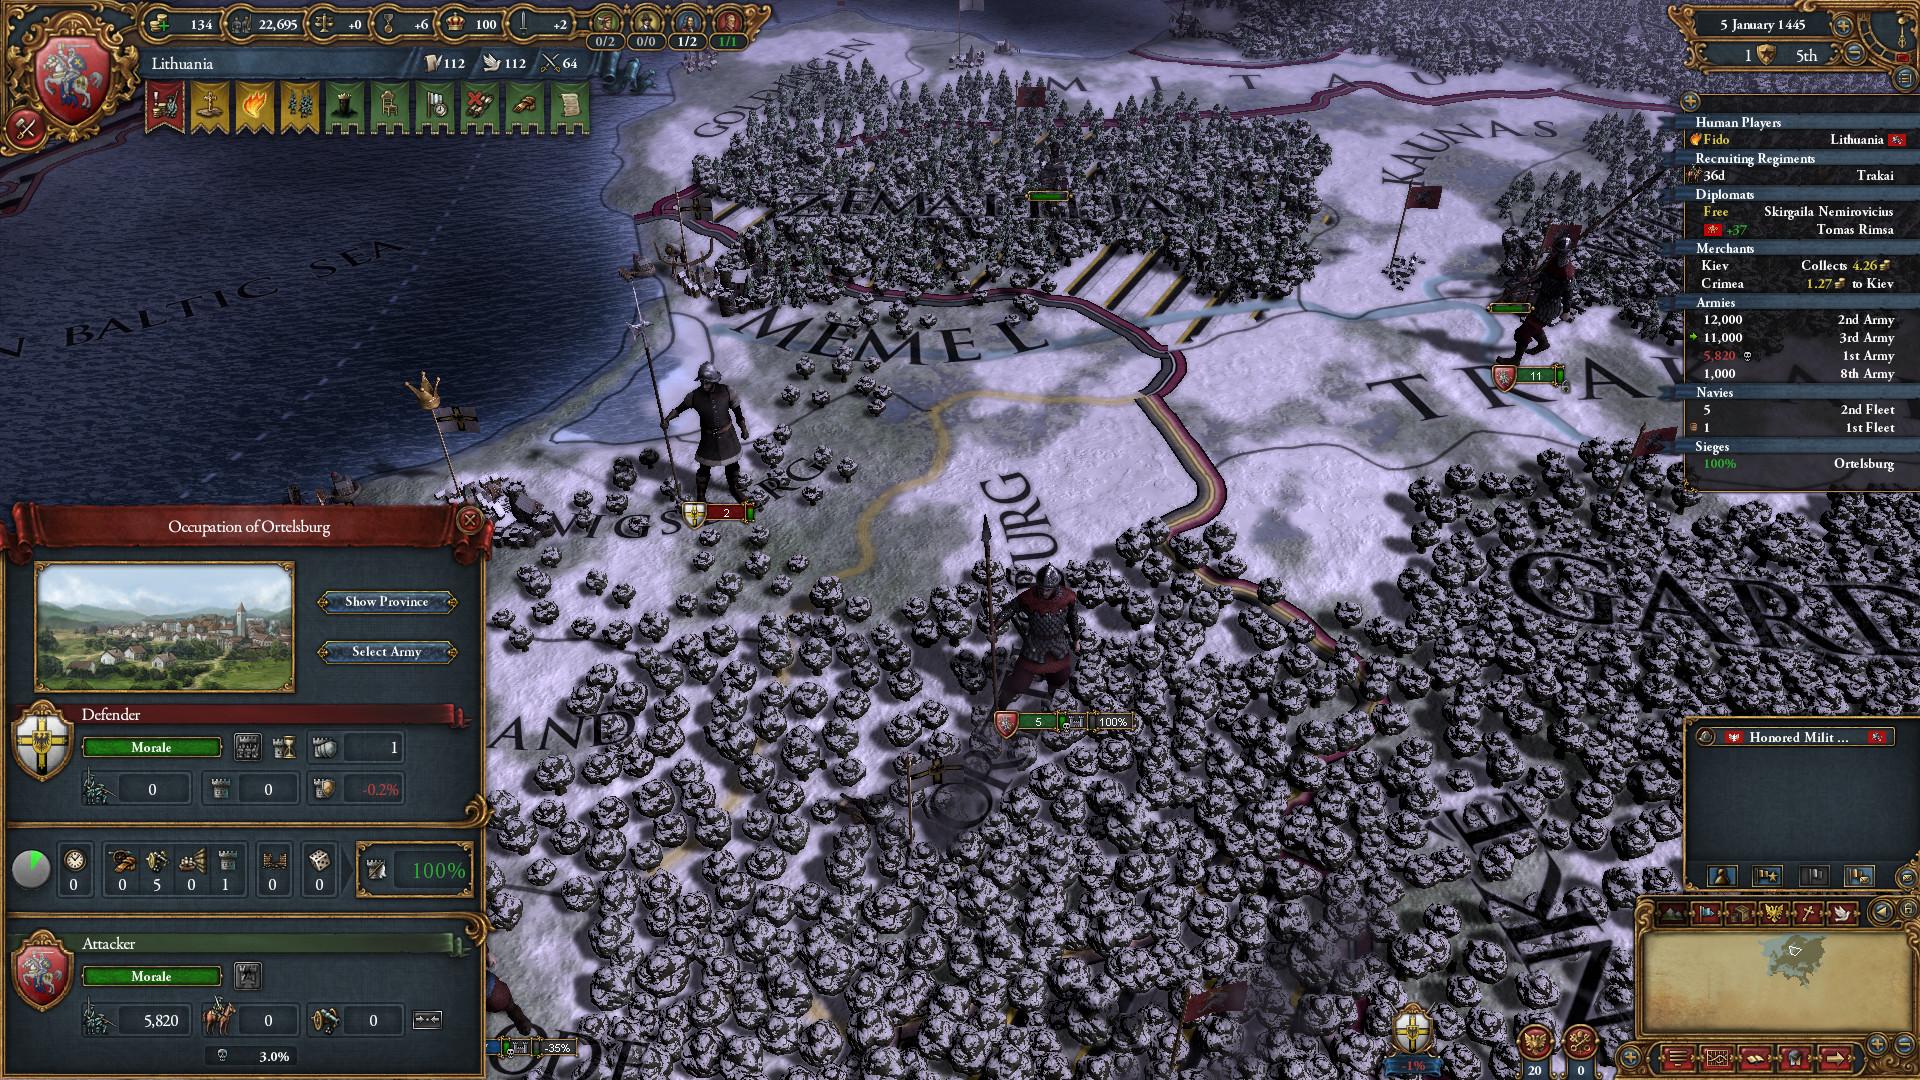 Expansion - Europa Universalis IV: Common Sense screenshot